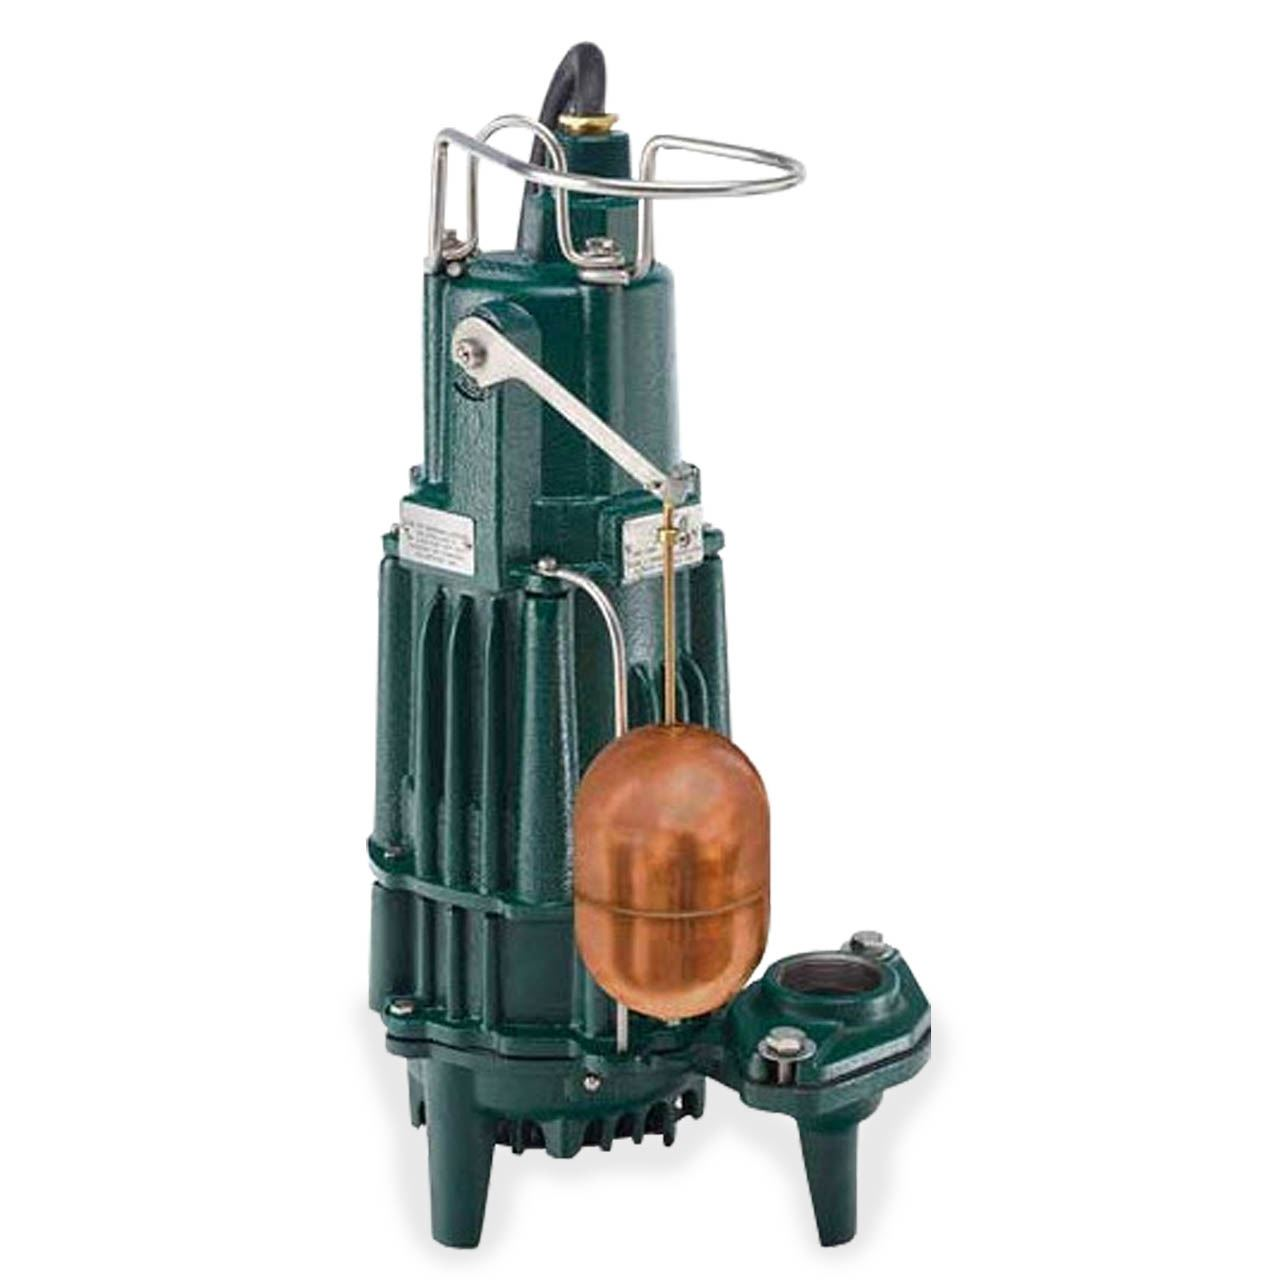 Zoeller Submersible Pump Wiring Diagram Simple Water 161 0071 Model Mx161 Explosion Proof High Head